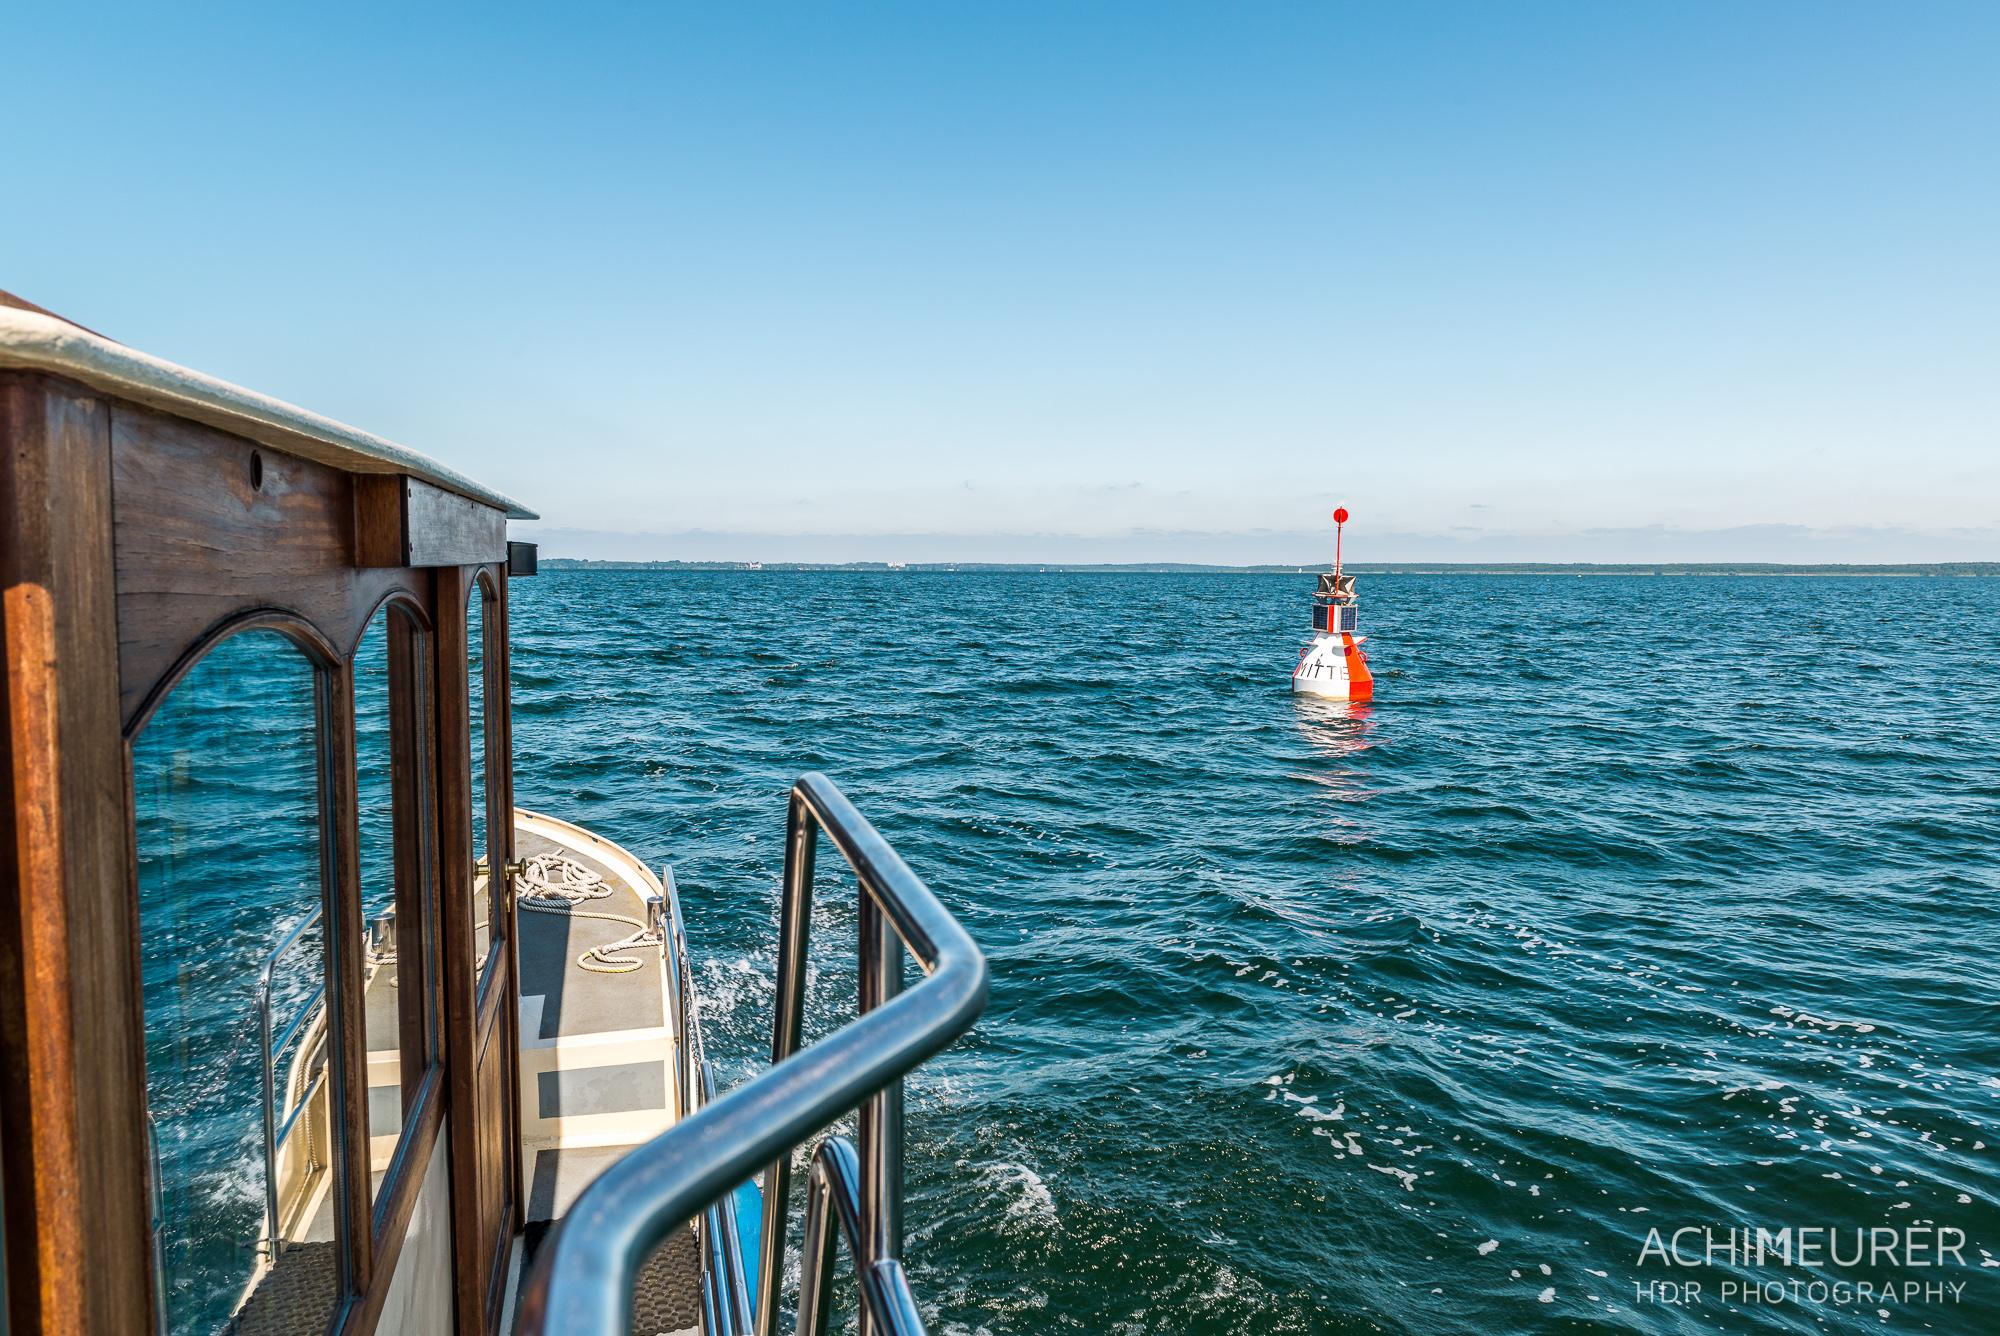 Hausboot-Kuhnle-Mueritz-Mecklenburg-Vorpommern-See_3541